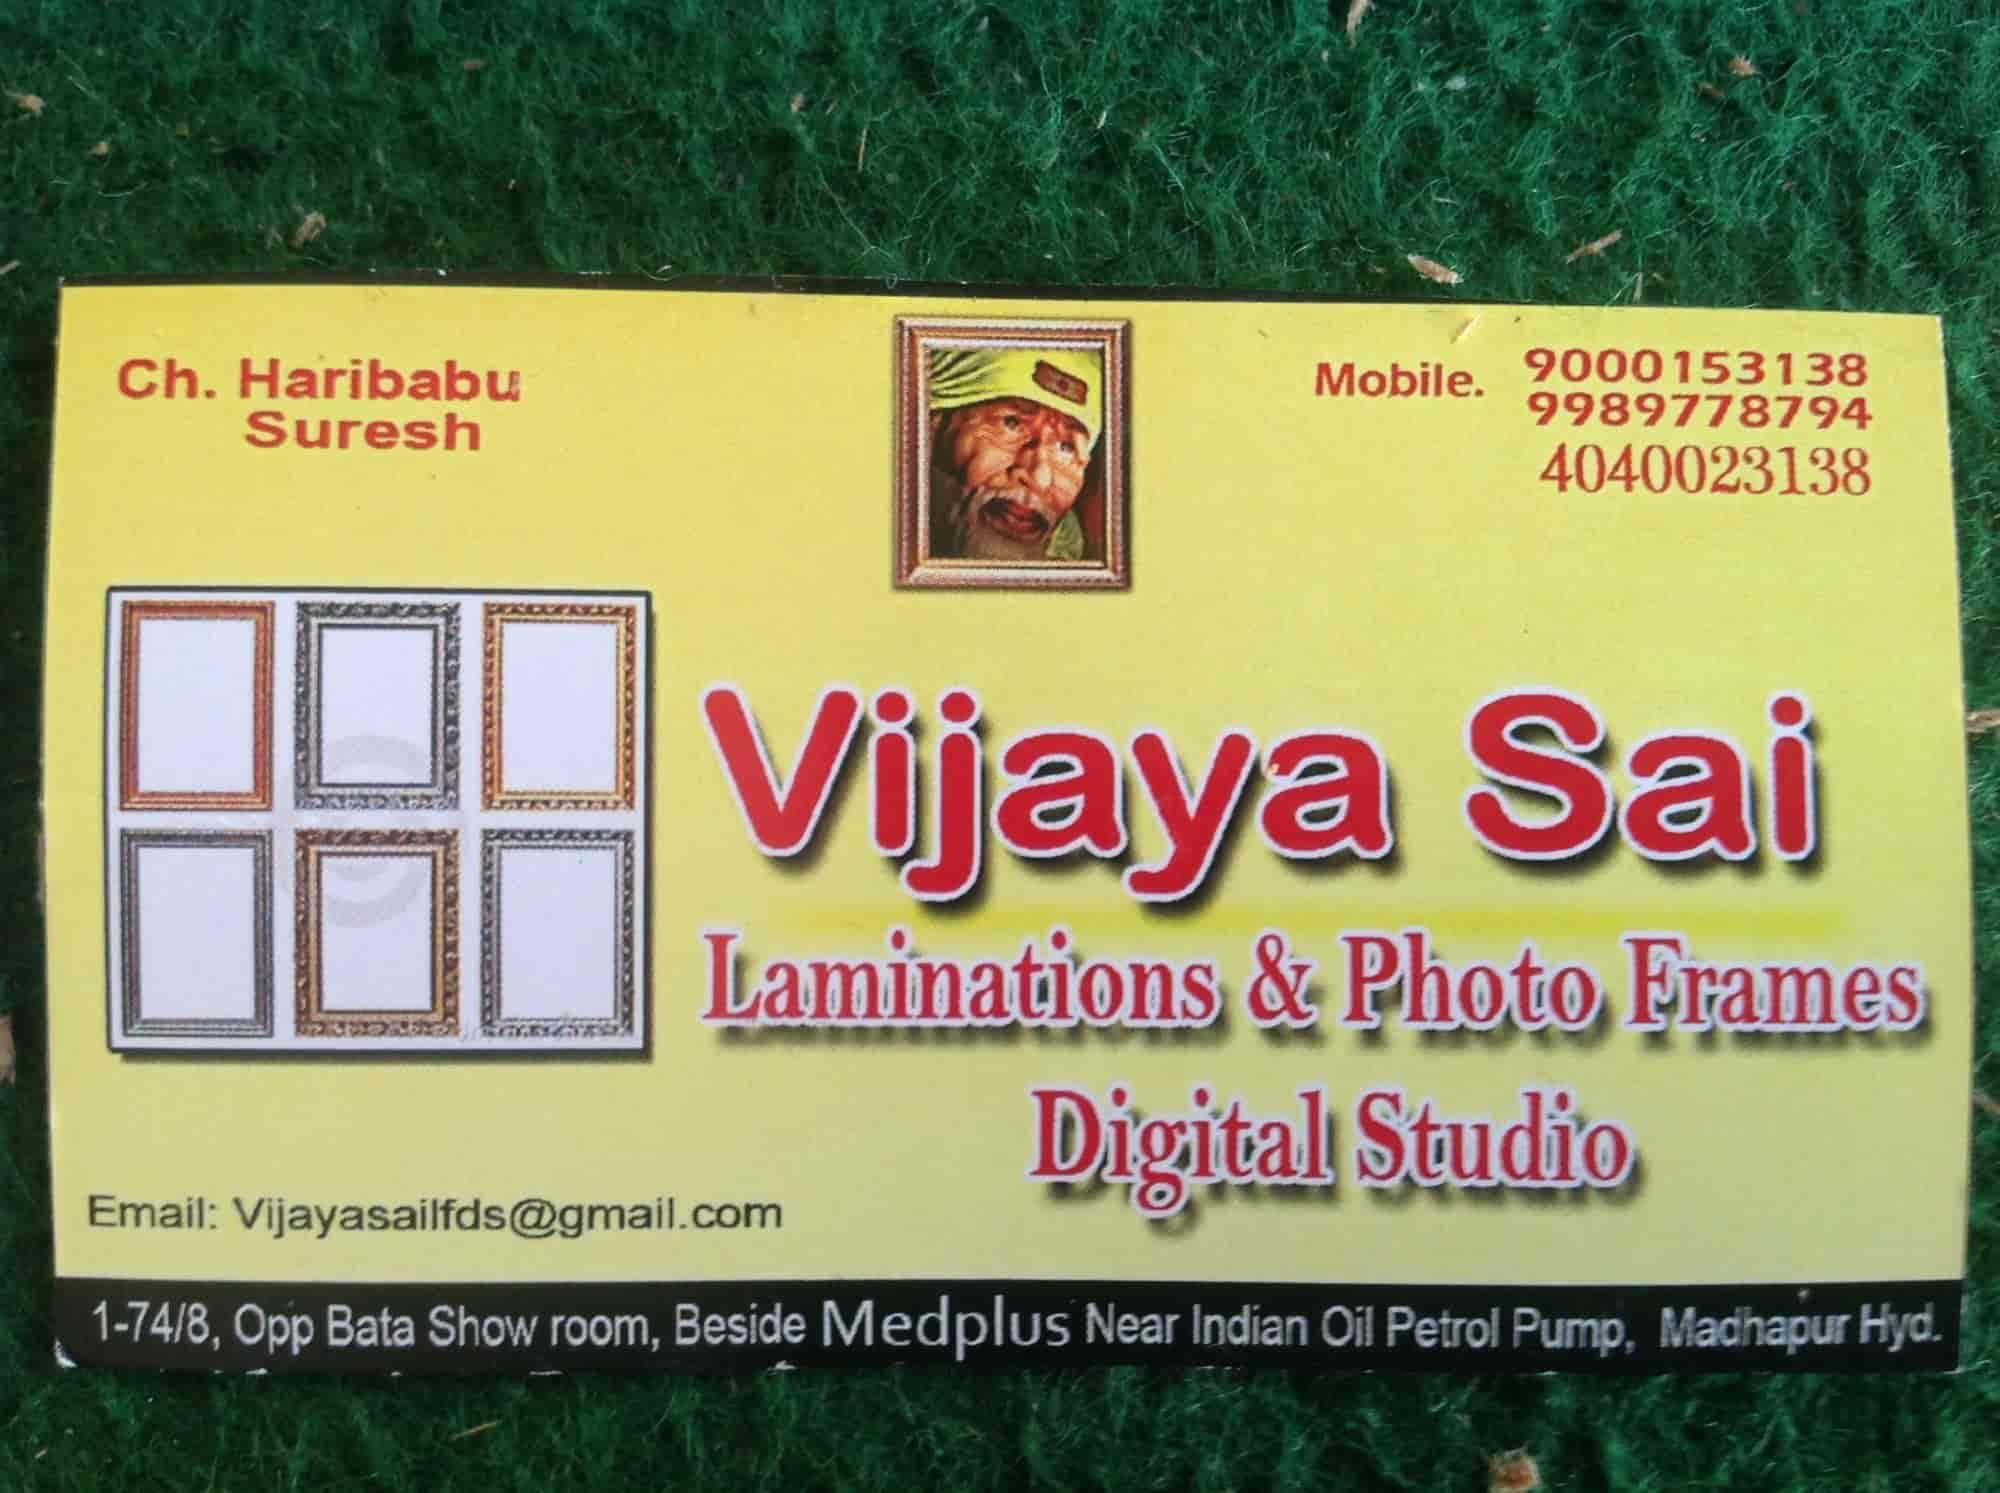 Vijaya sai photo frames and lamination digital studio madhapur vijaya sai photo frames and lamination digital studio madhapur vijaya sai photo frames lamination digital studio photo studios in hyderabad jeuxipadfo Choice Image